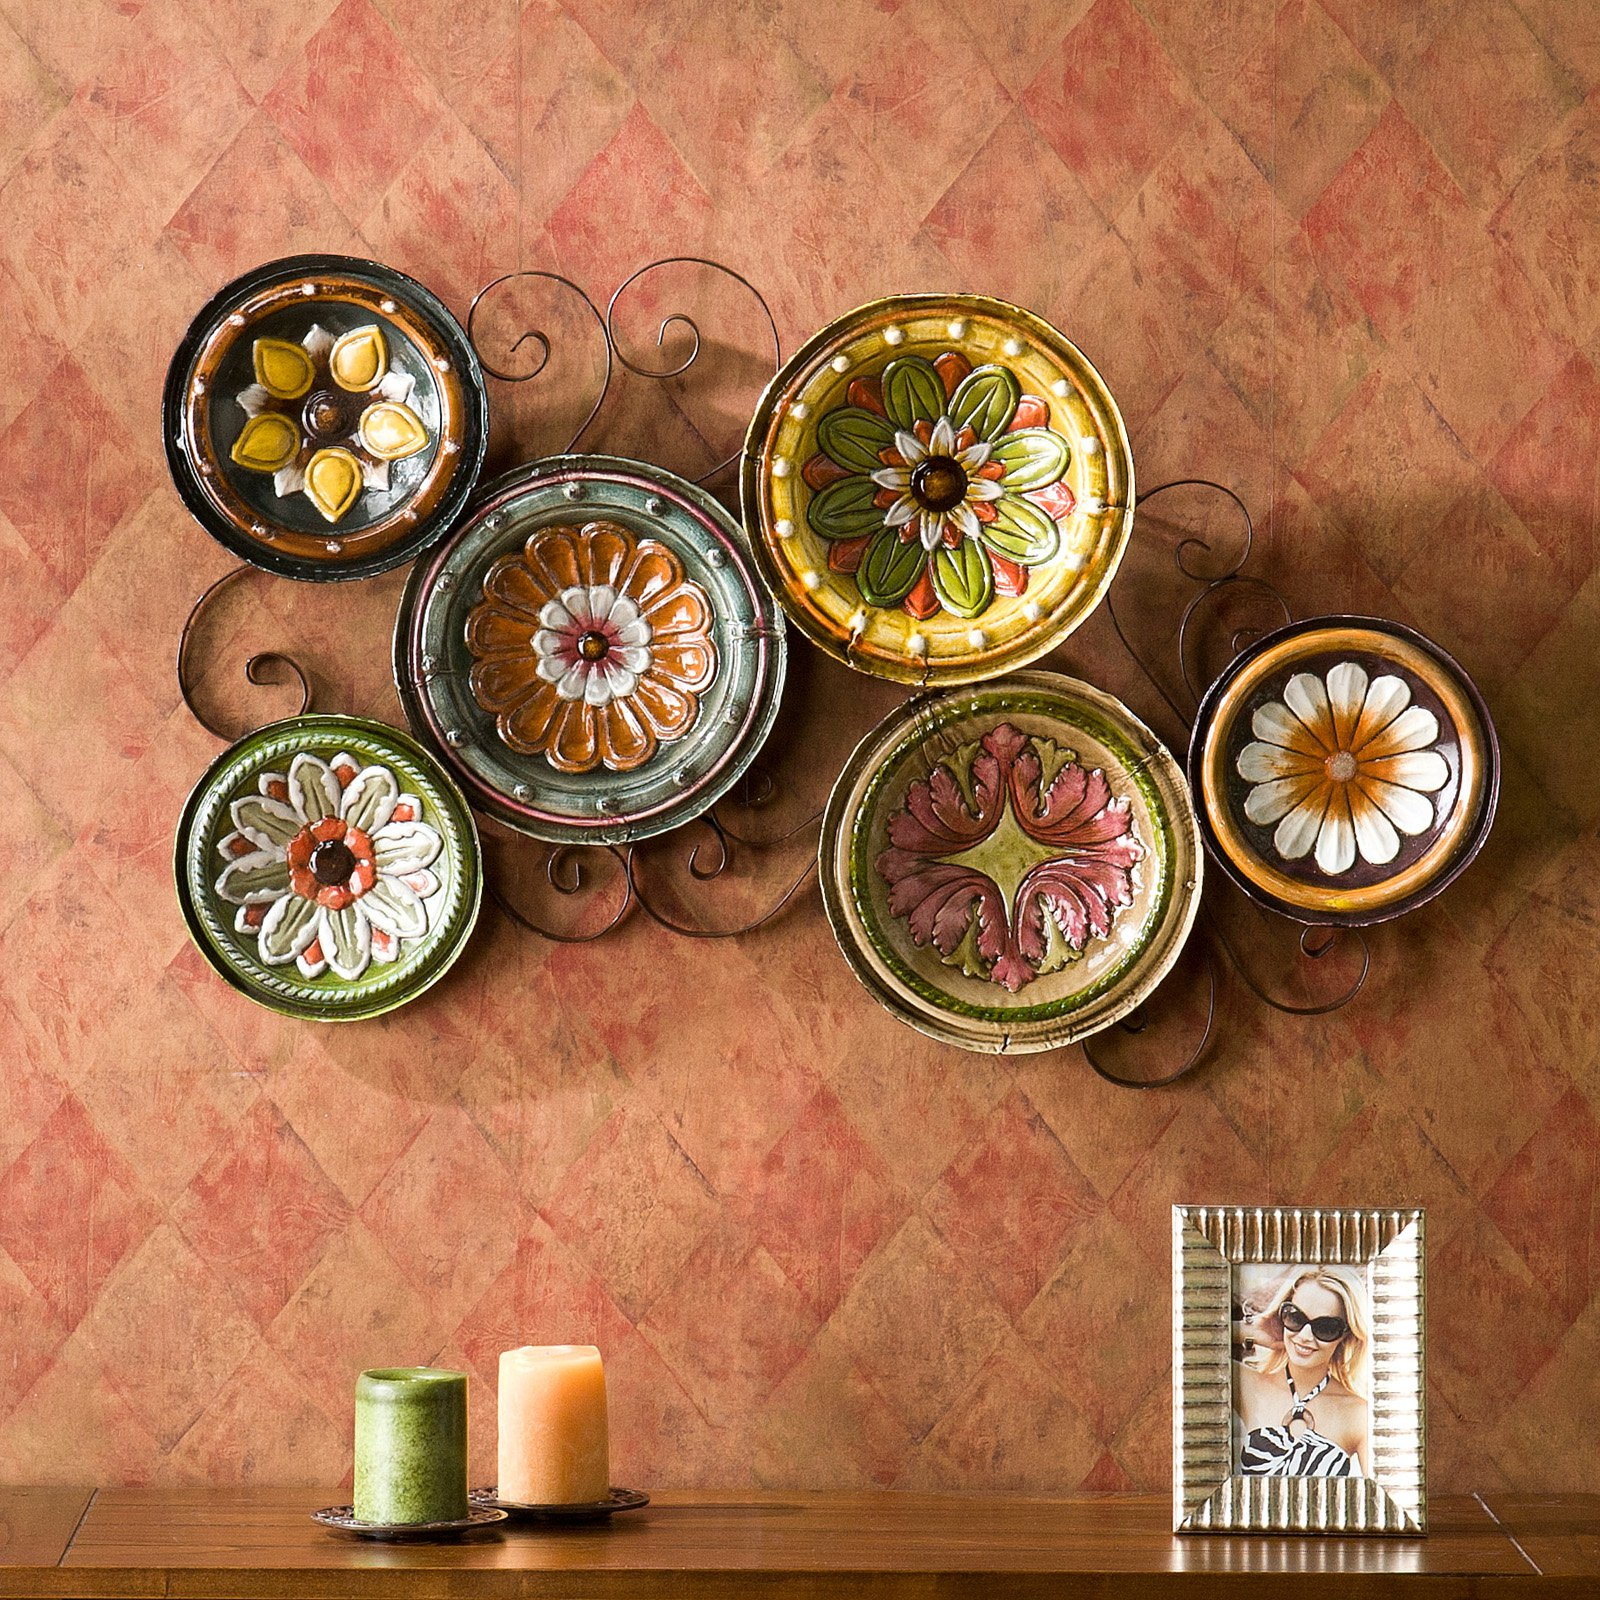 Southern Enterprises Milan Italian Plates Wall Art